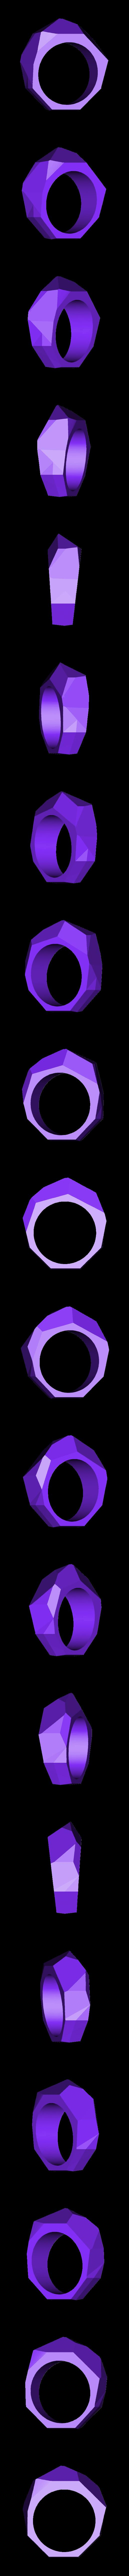 "10.stl Download free STL file the ""Bling Rings"" • 3D print model, leFabShop"